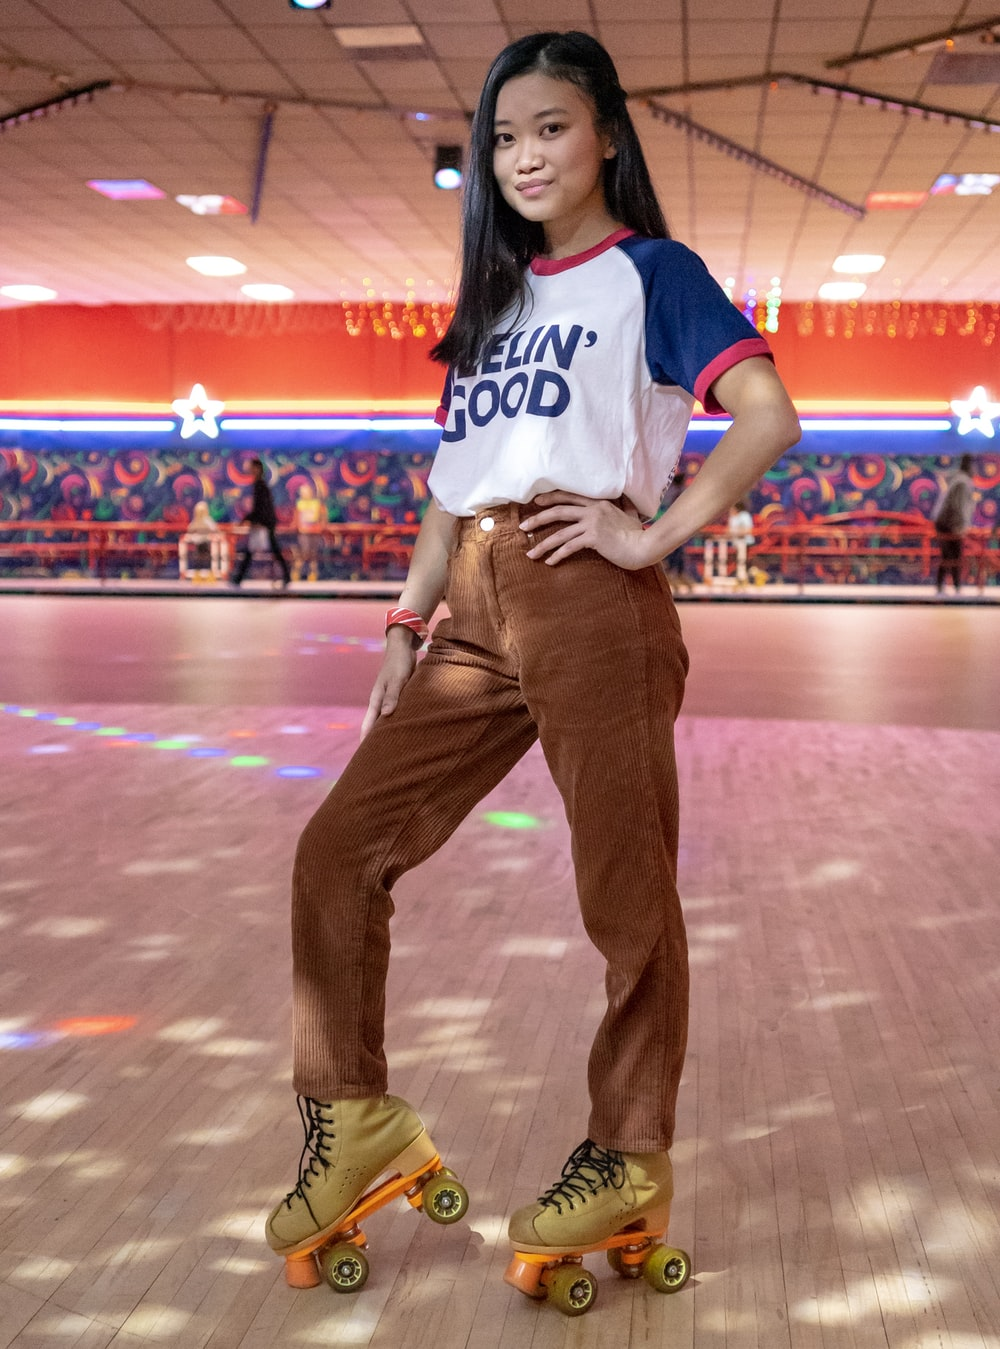 standing woman using roller skates inside building